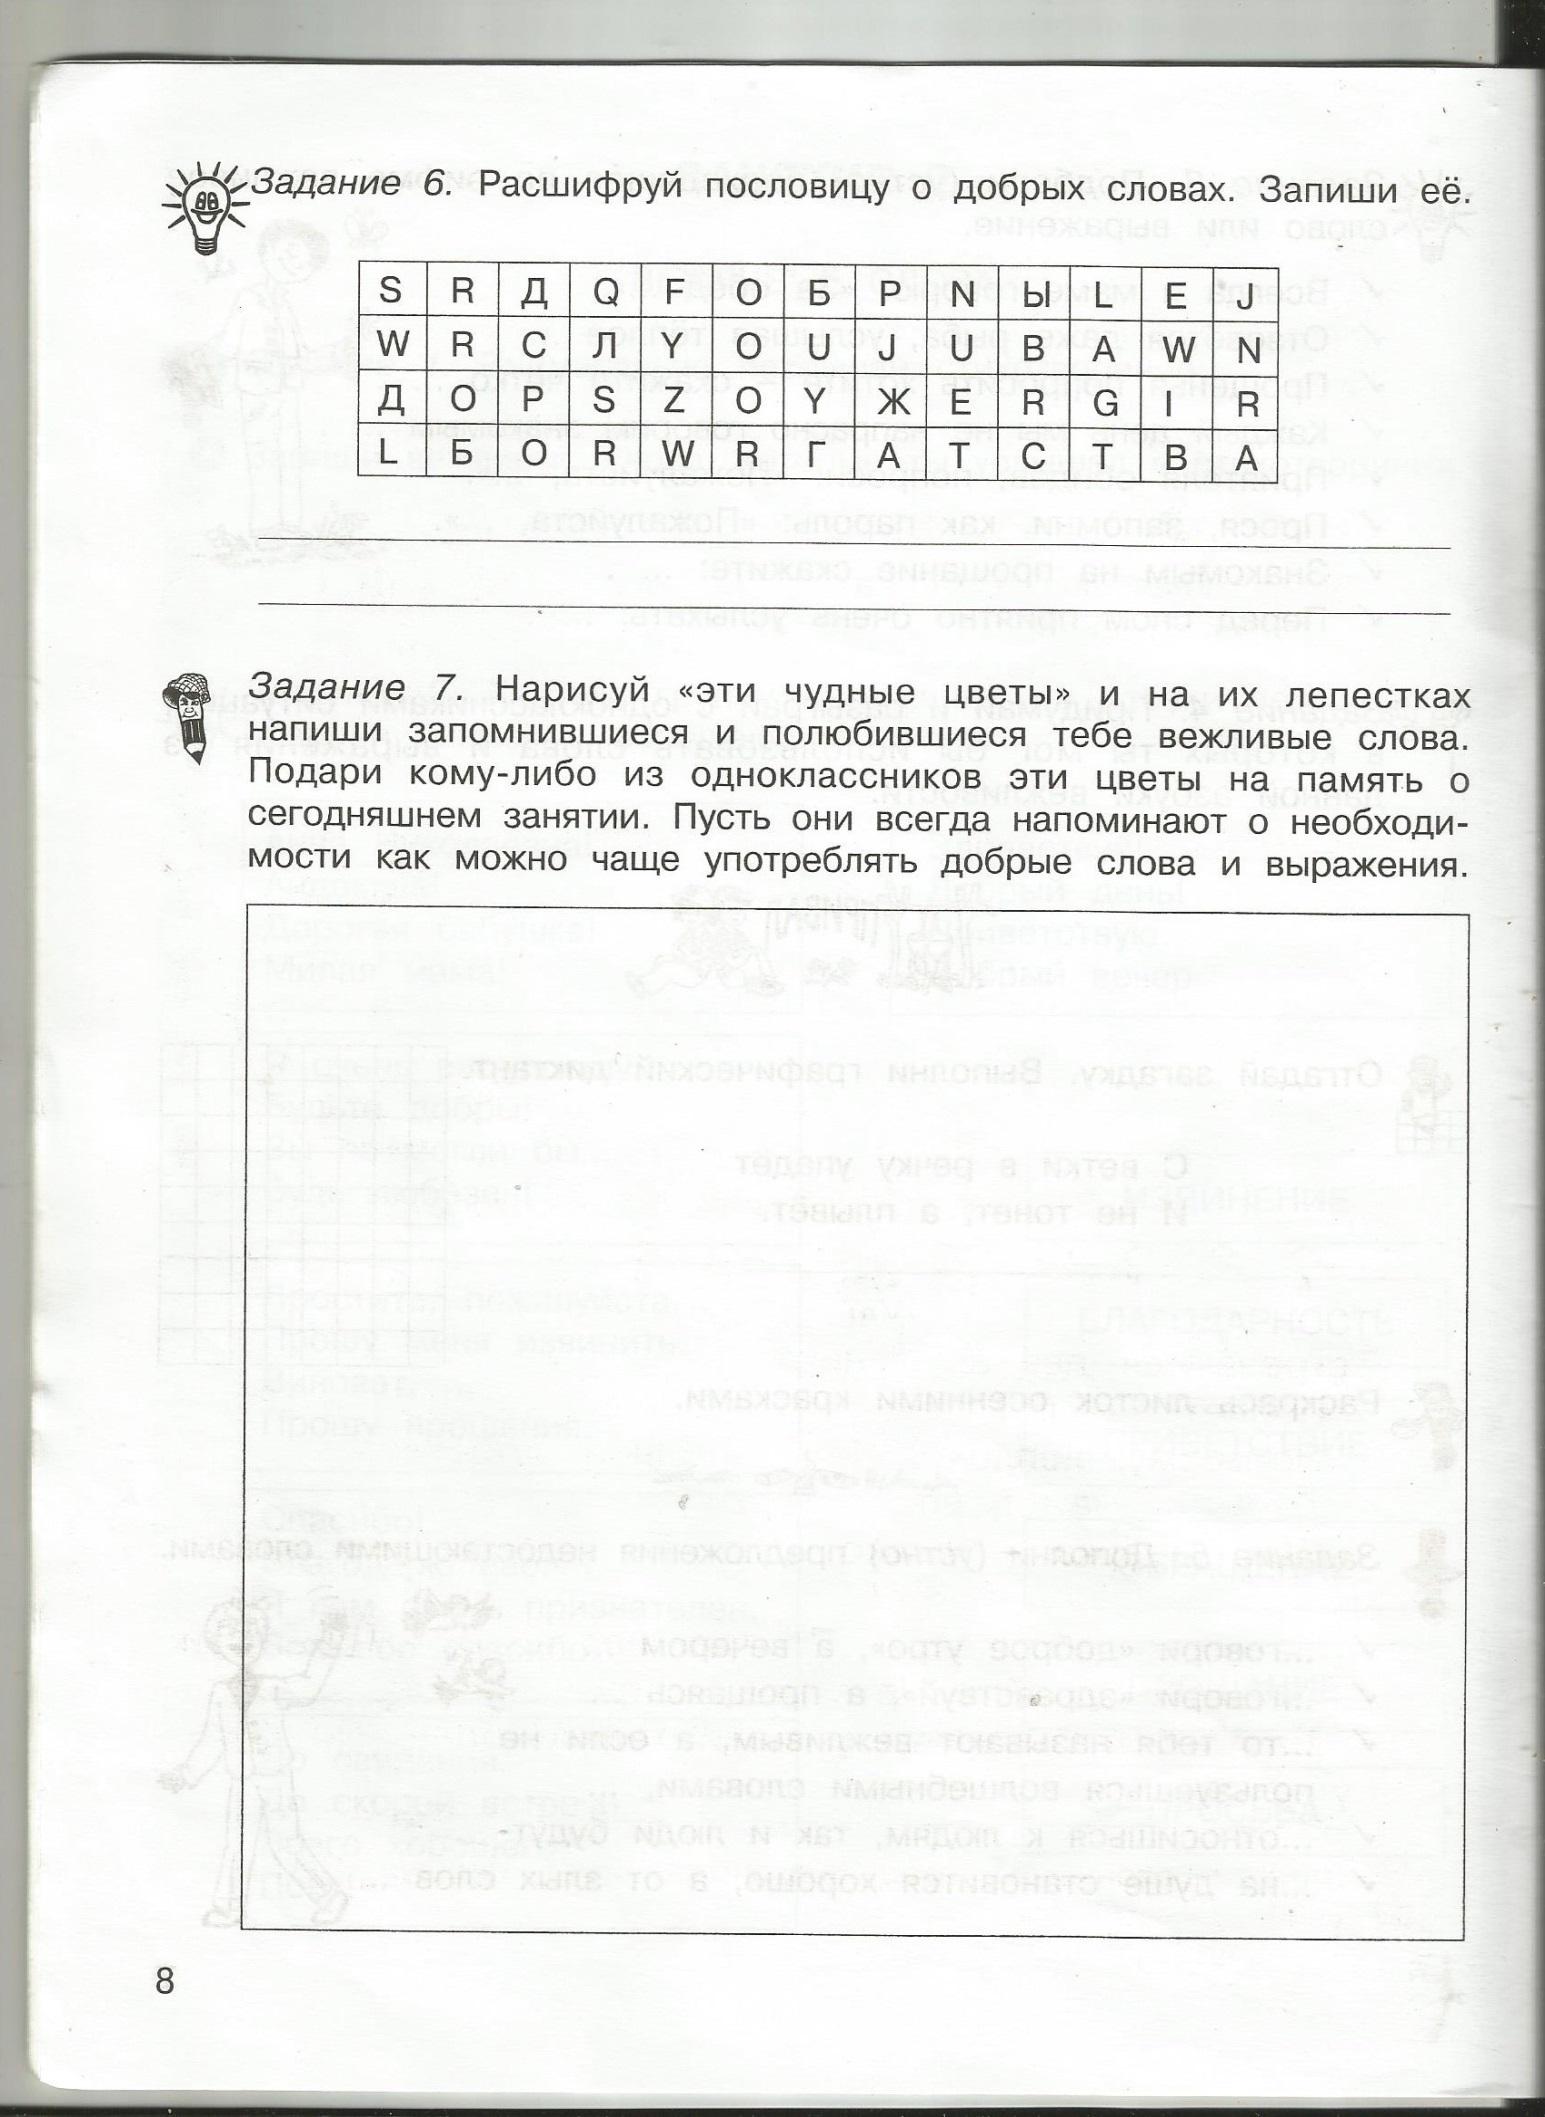 C:\Users\1\Documents\вкр Кулямсаровой А 46 гр\сборник упр\к сборнику\Scan0023 (4).jpg